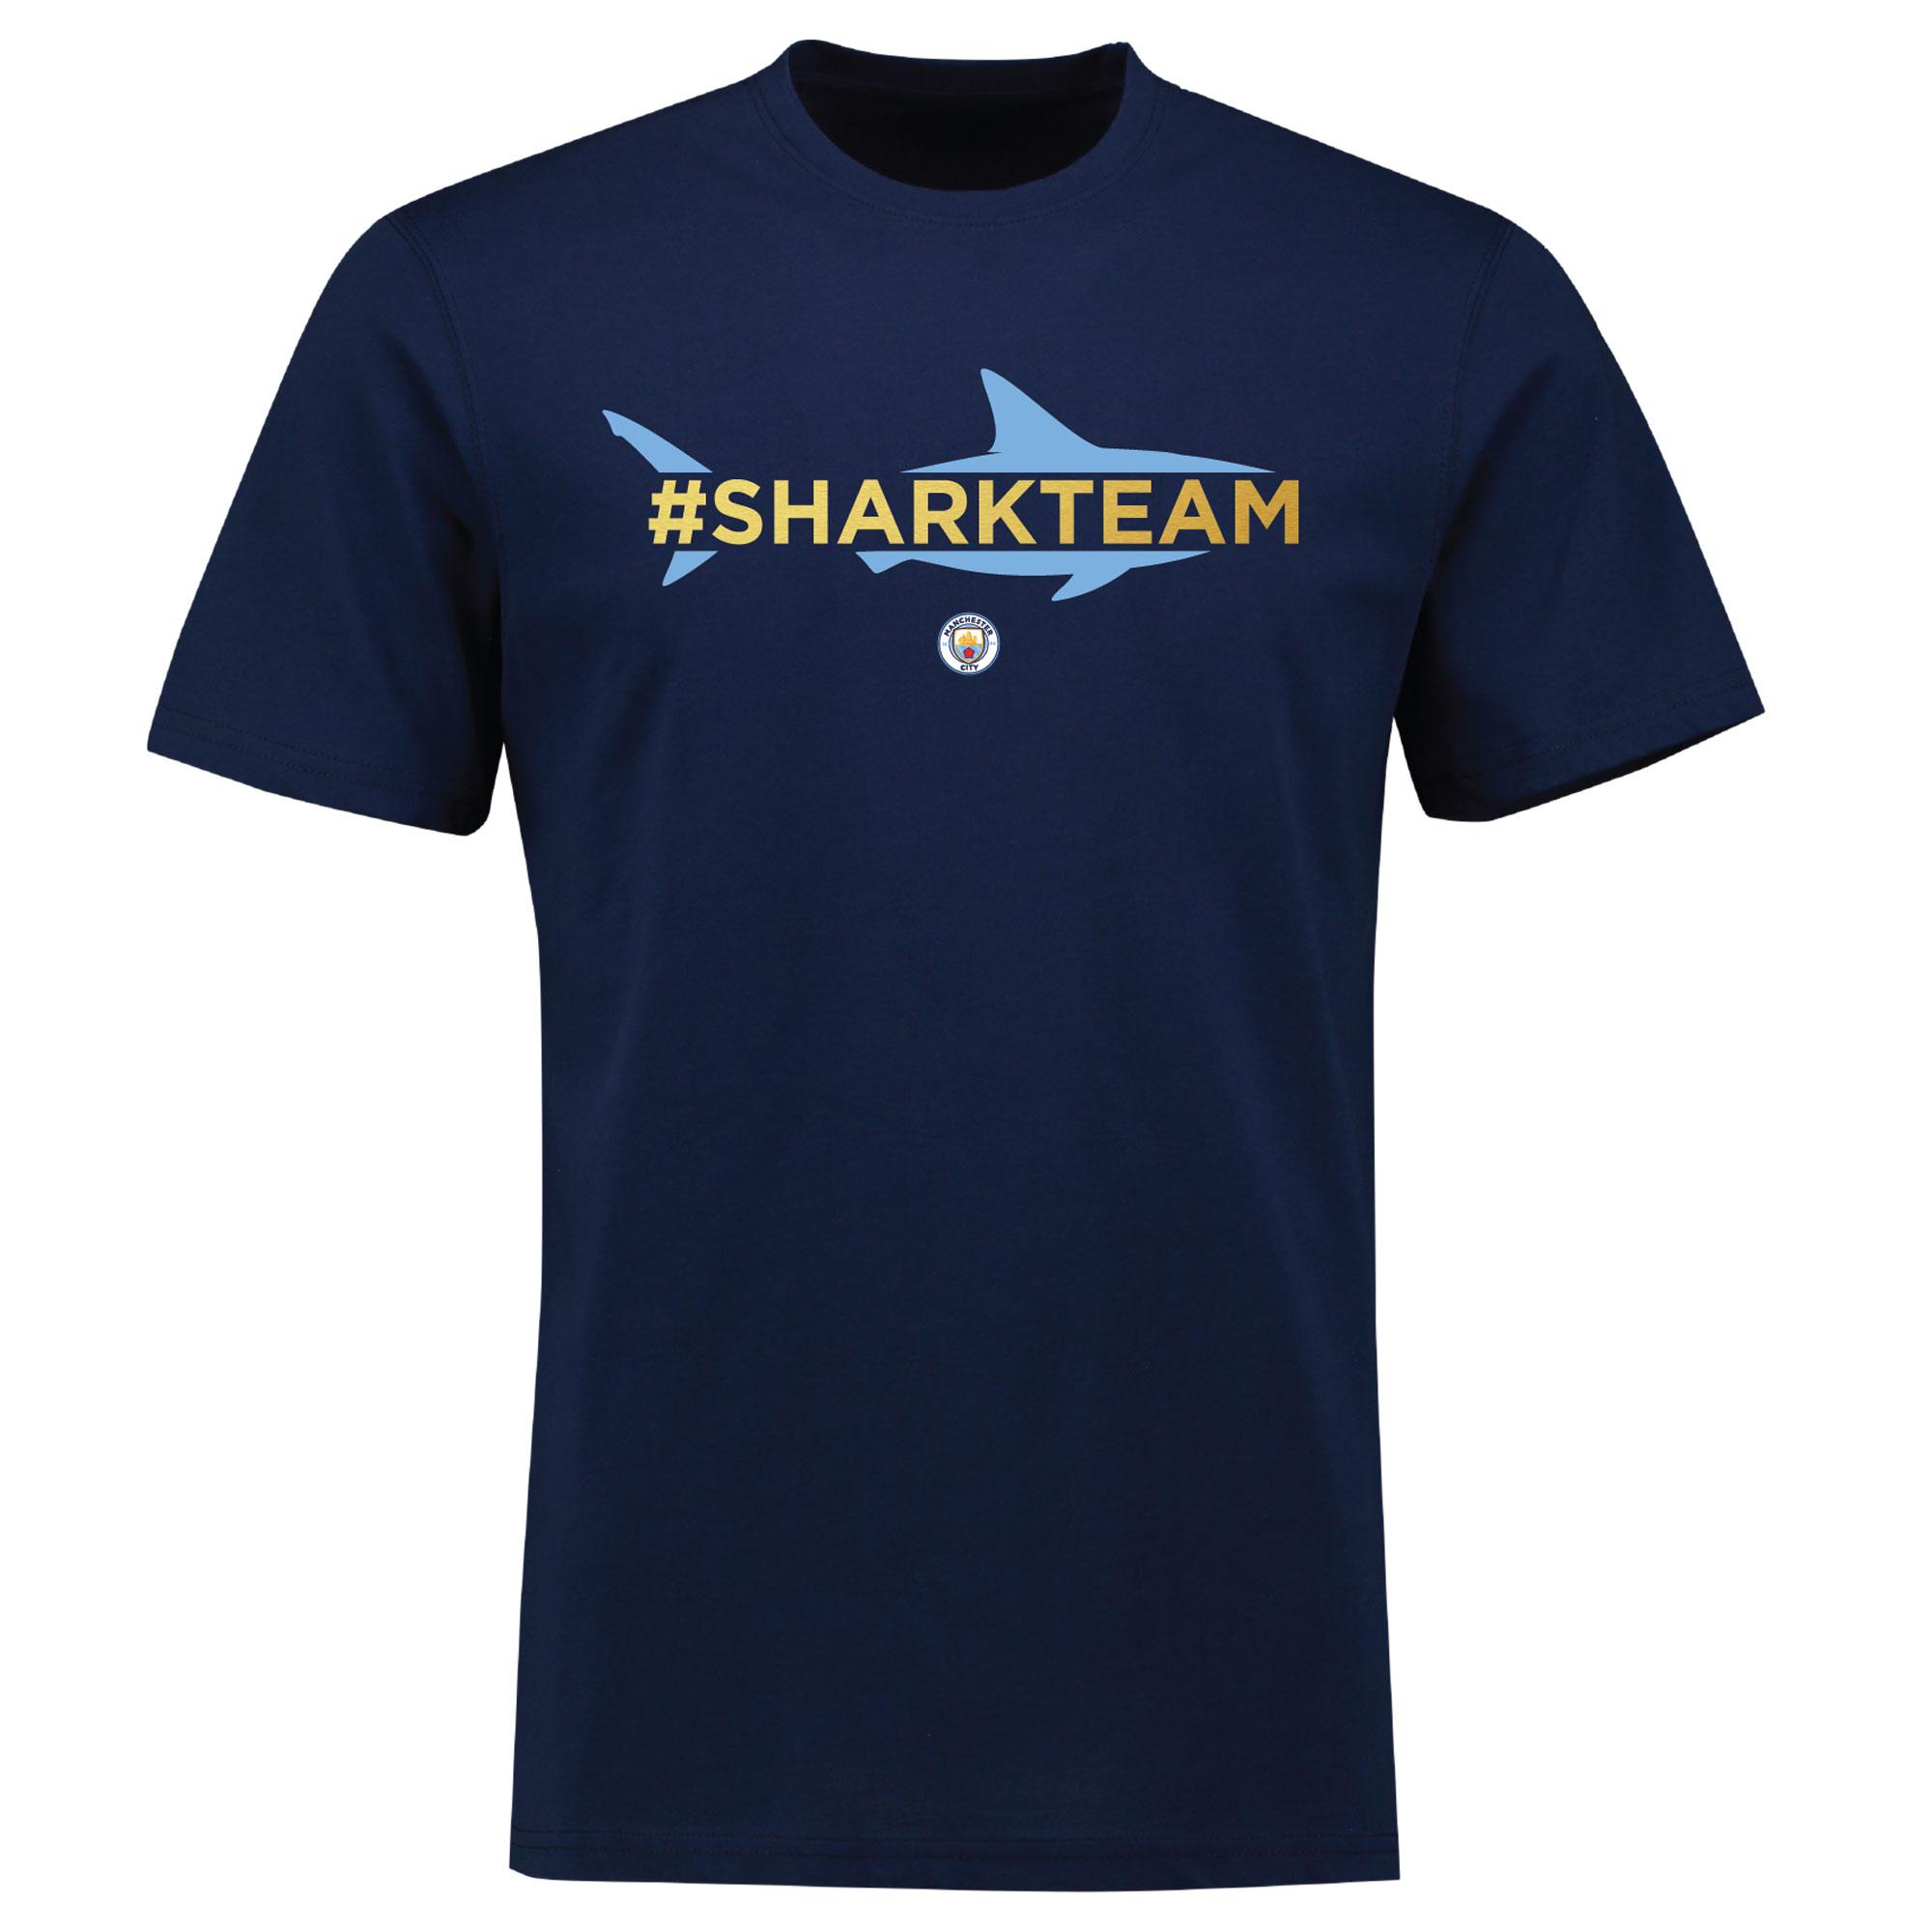 Manchester City Benjamin Mendy SHARK TEAM Hashtag T Shirt - Womens - N